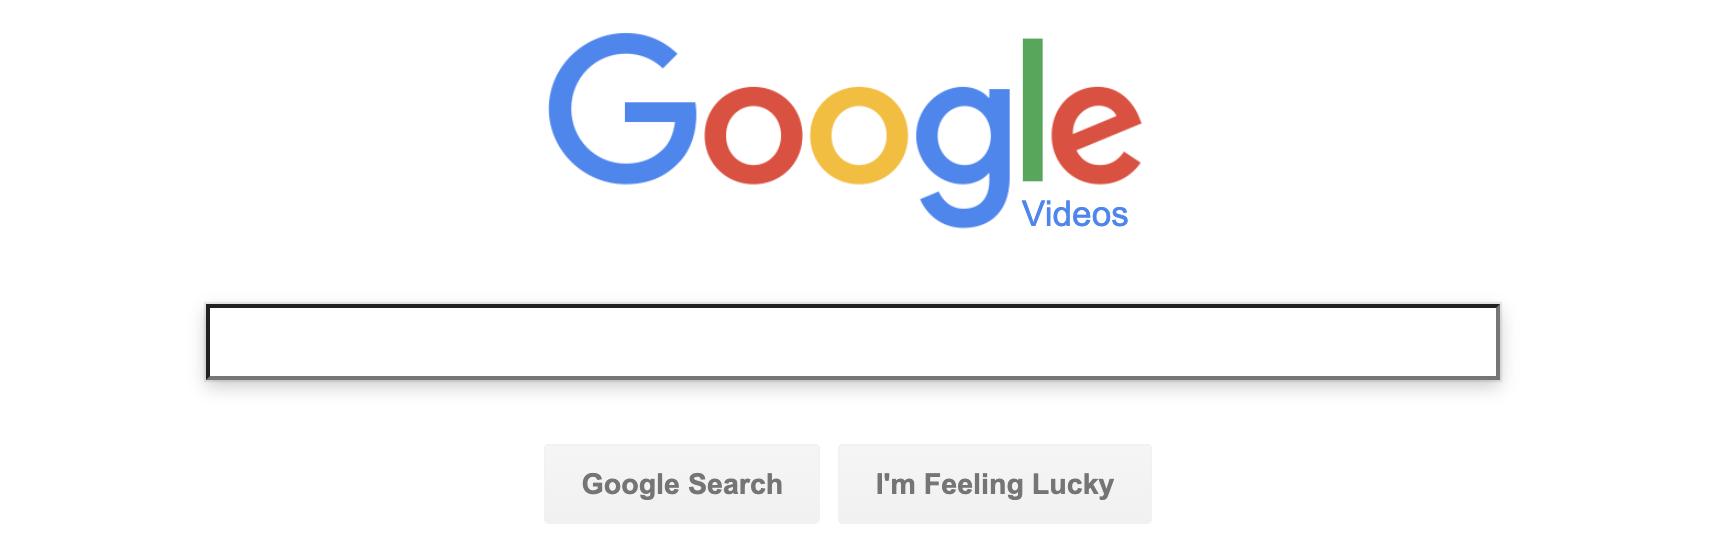 google-video-banner